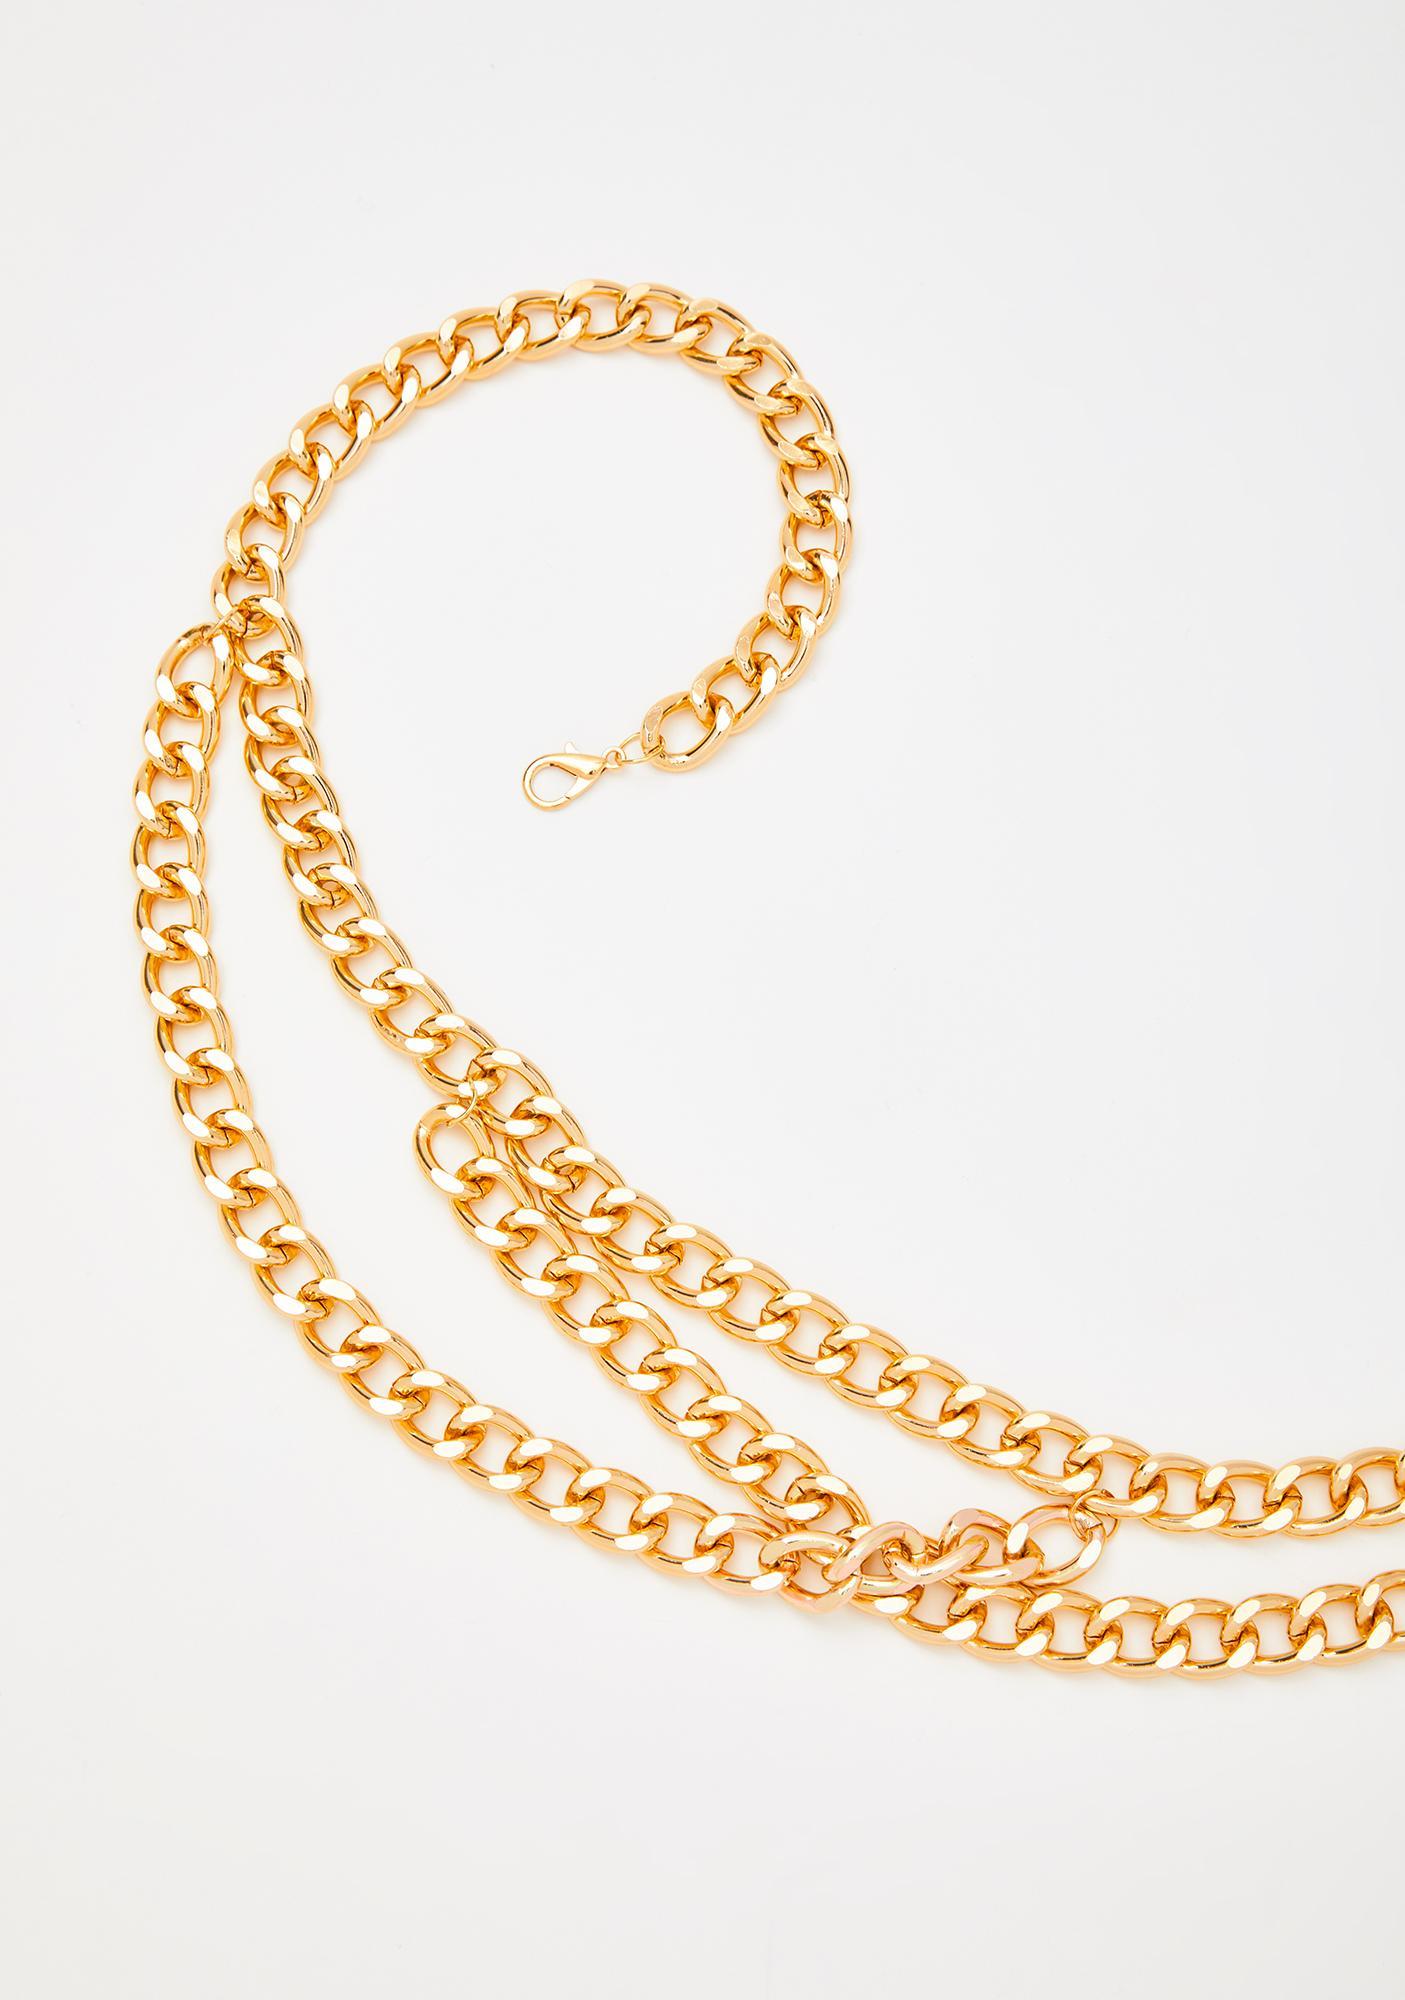 Riches On Riches Chain Belt